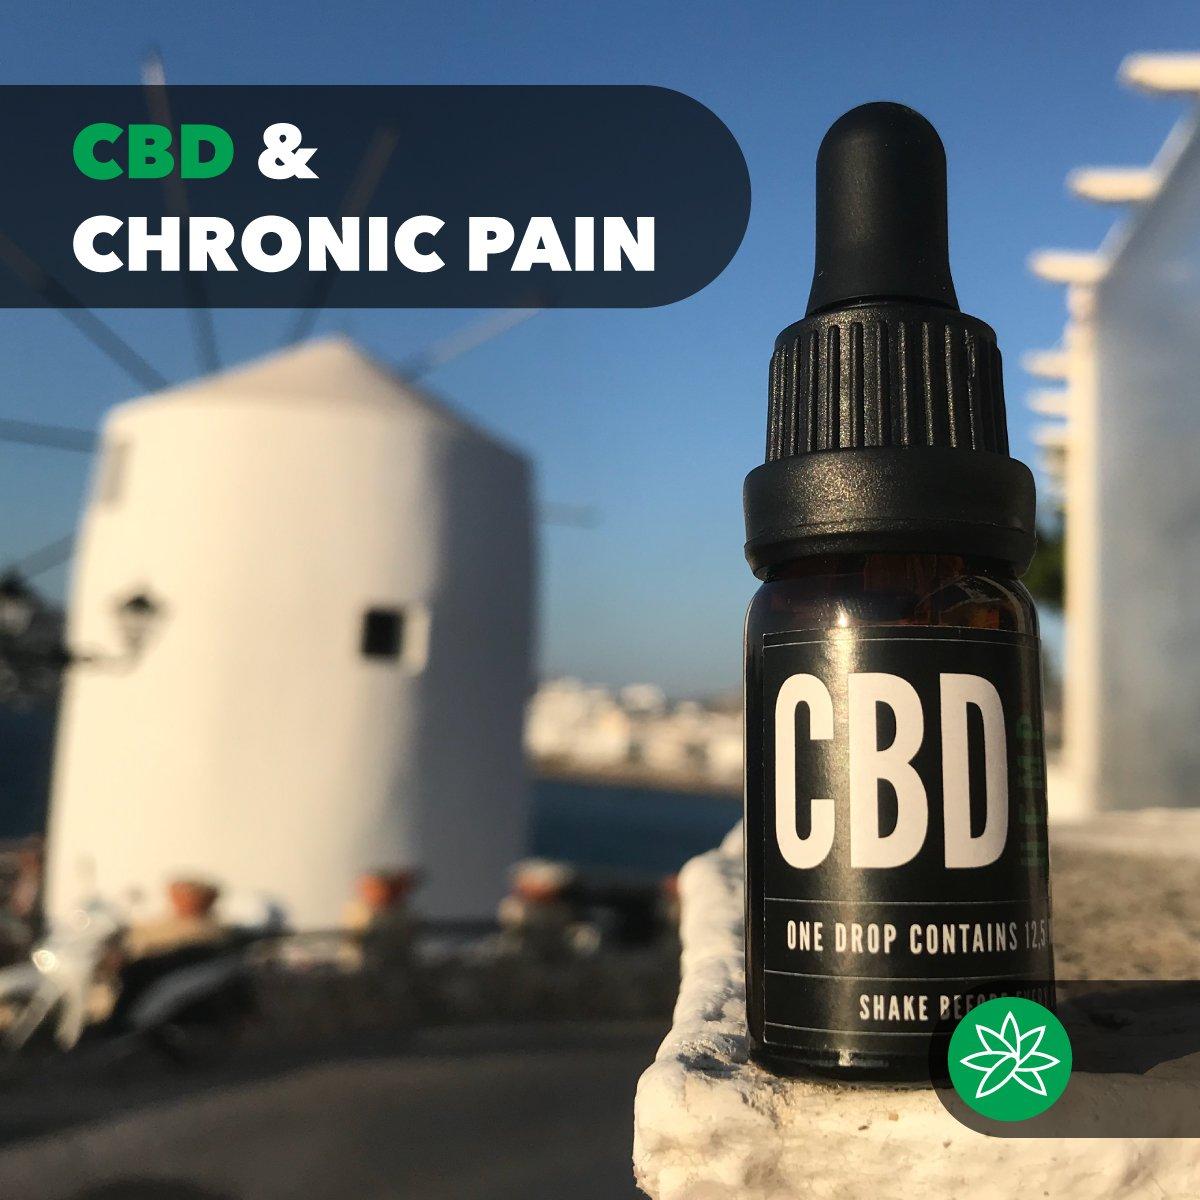 CBD & chronic pain